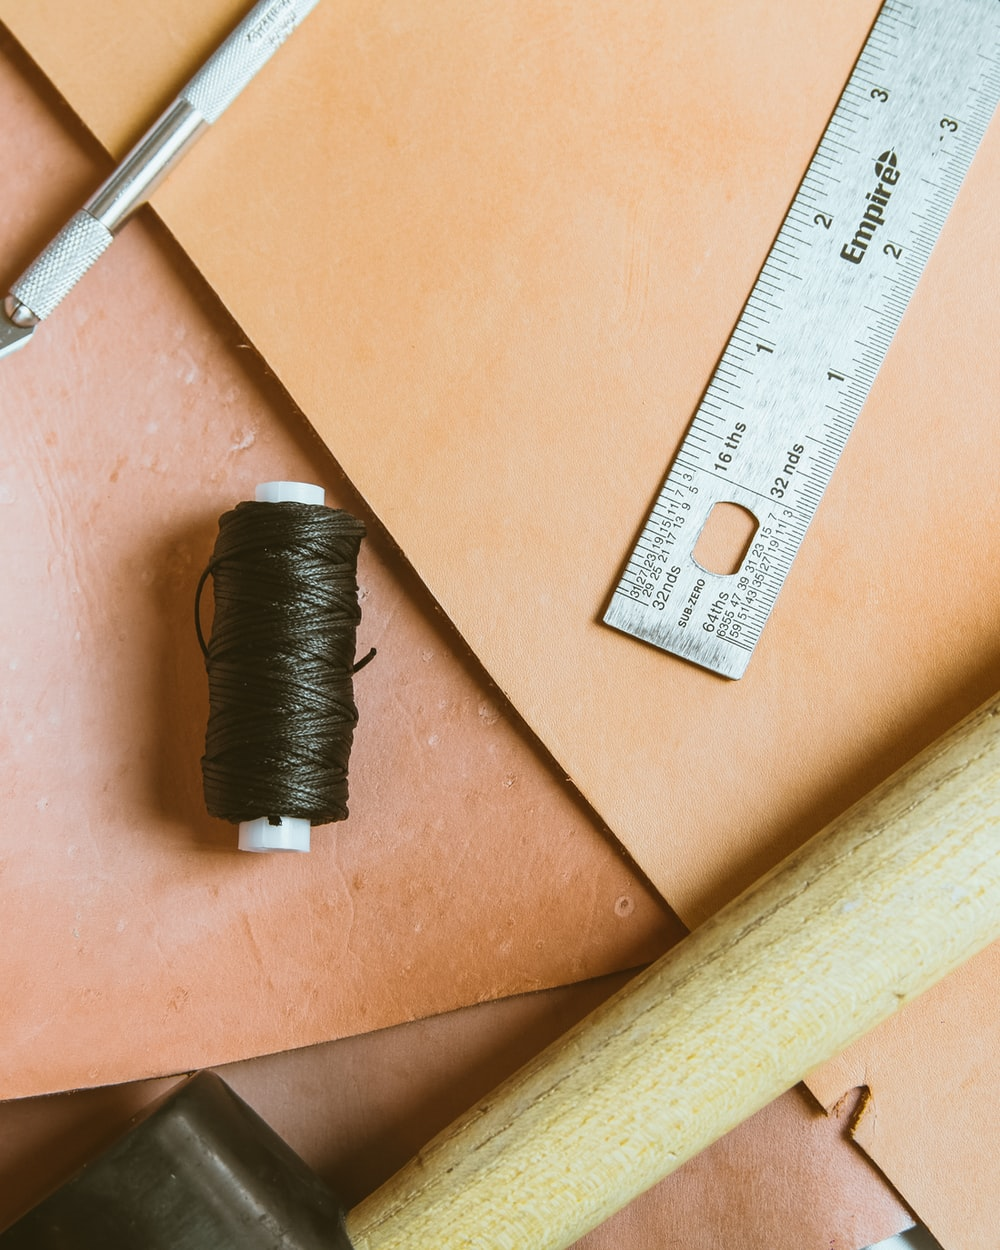 closeup photo of ruler and thread